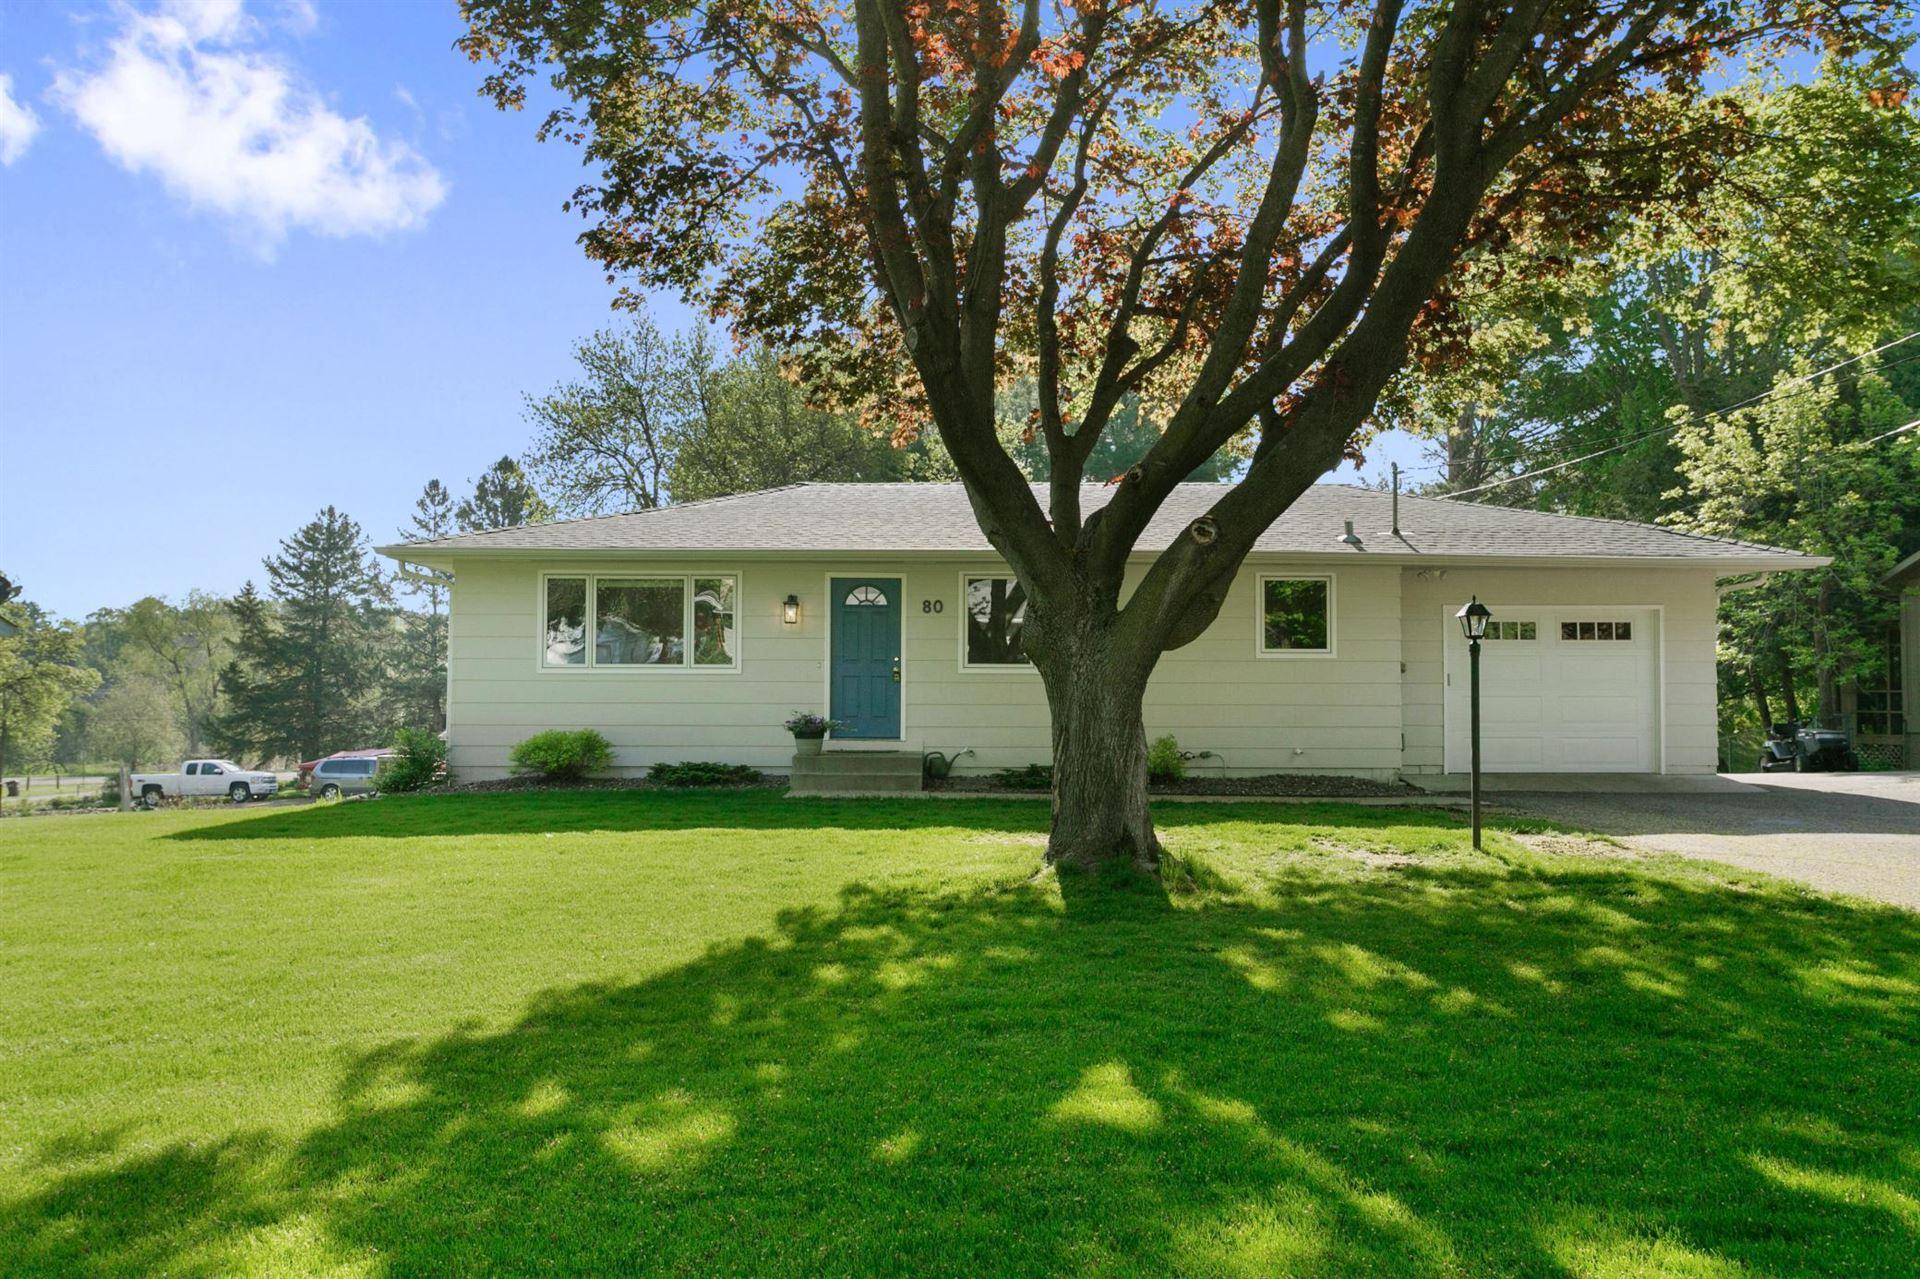 80 Hackberry Hill, Orono, MN 55356 - MLS#: 5759488